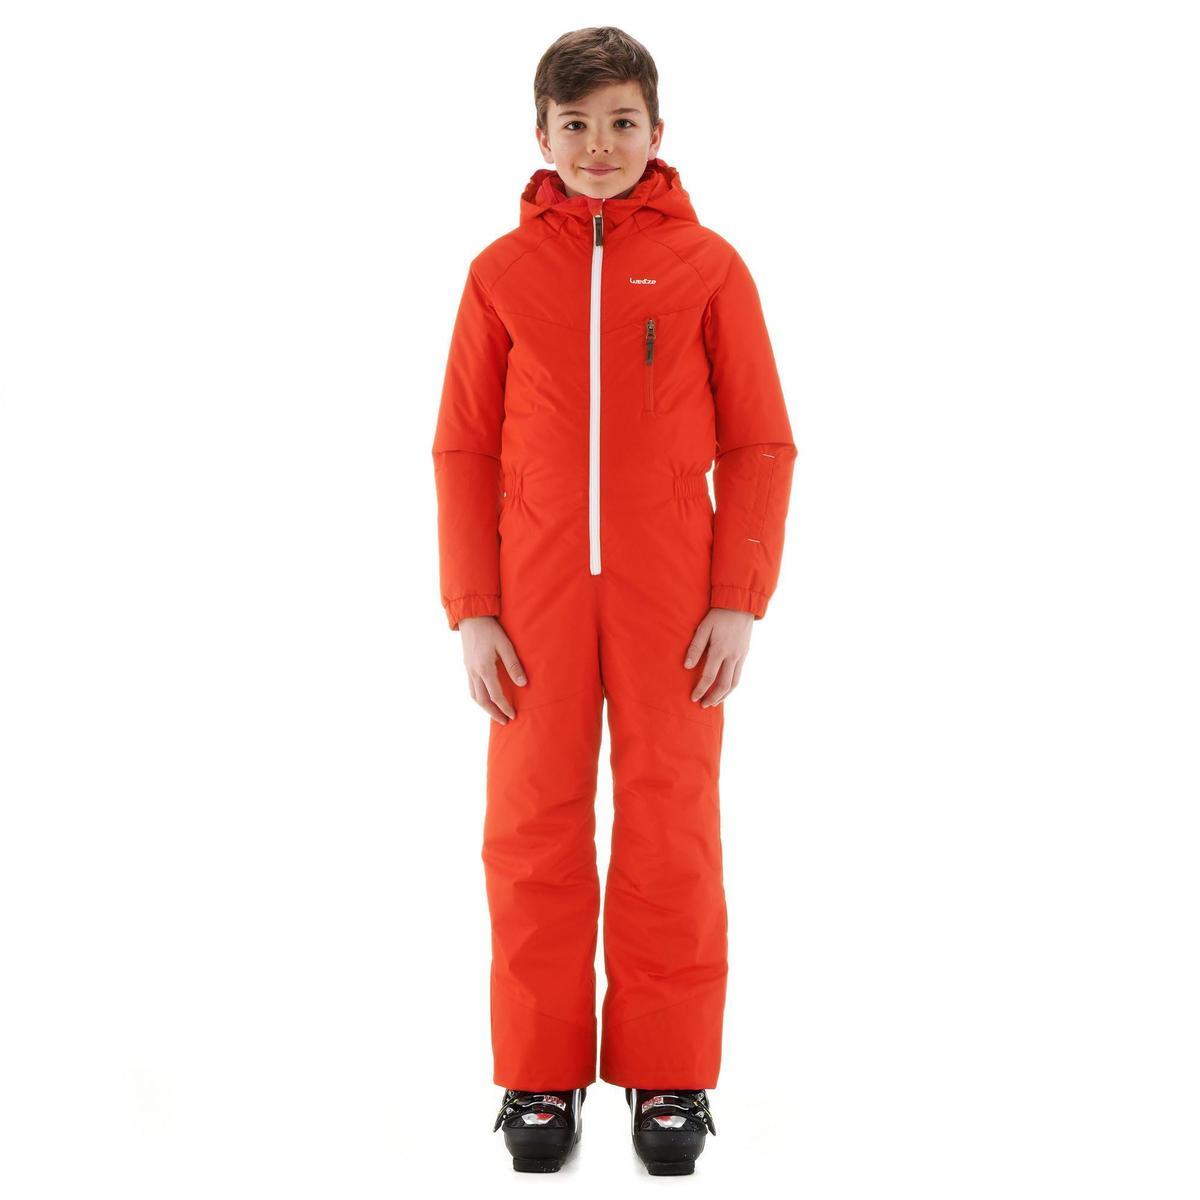 Bild 3 von Skianzug GL 100 Kinder rot/orange